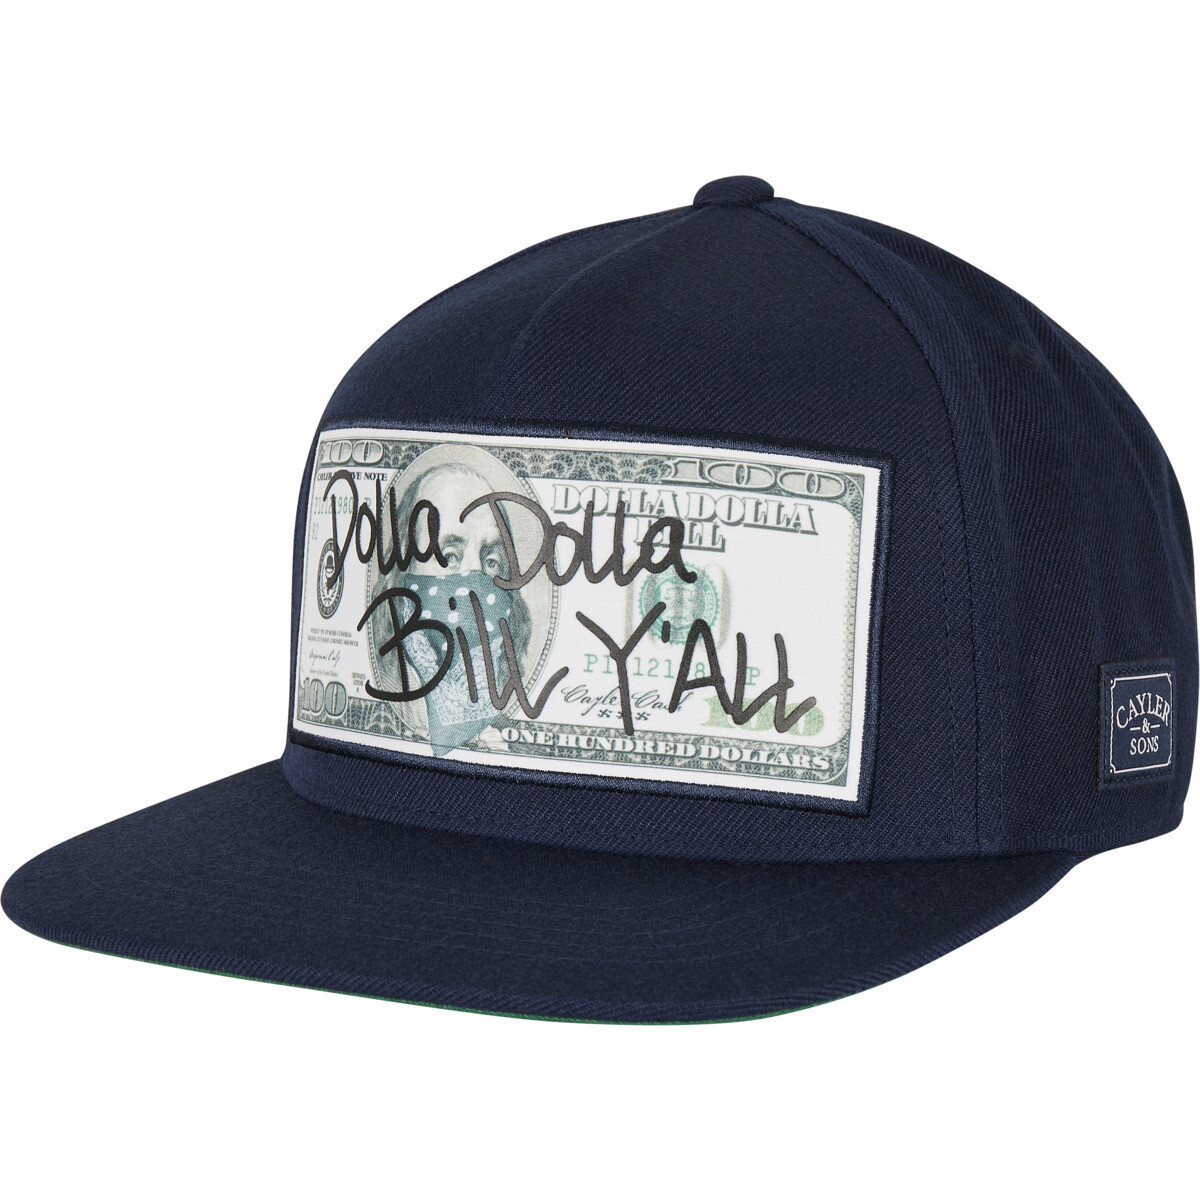 C&S WL Dolla Billy Cap